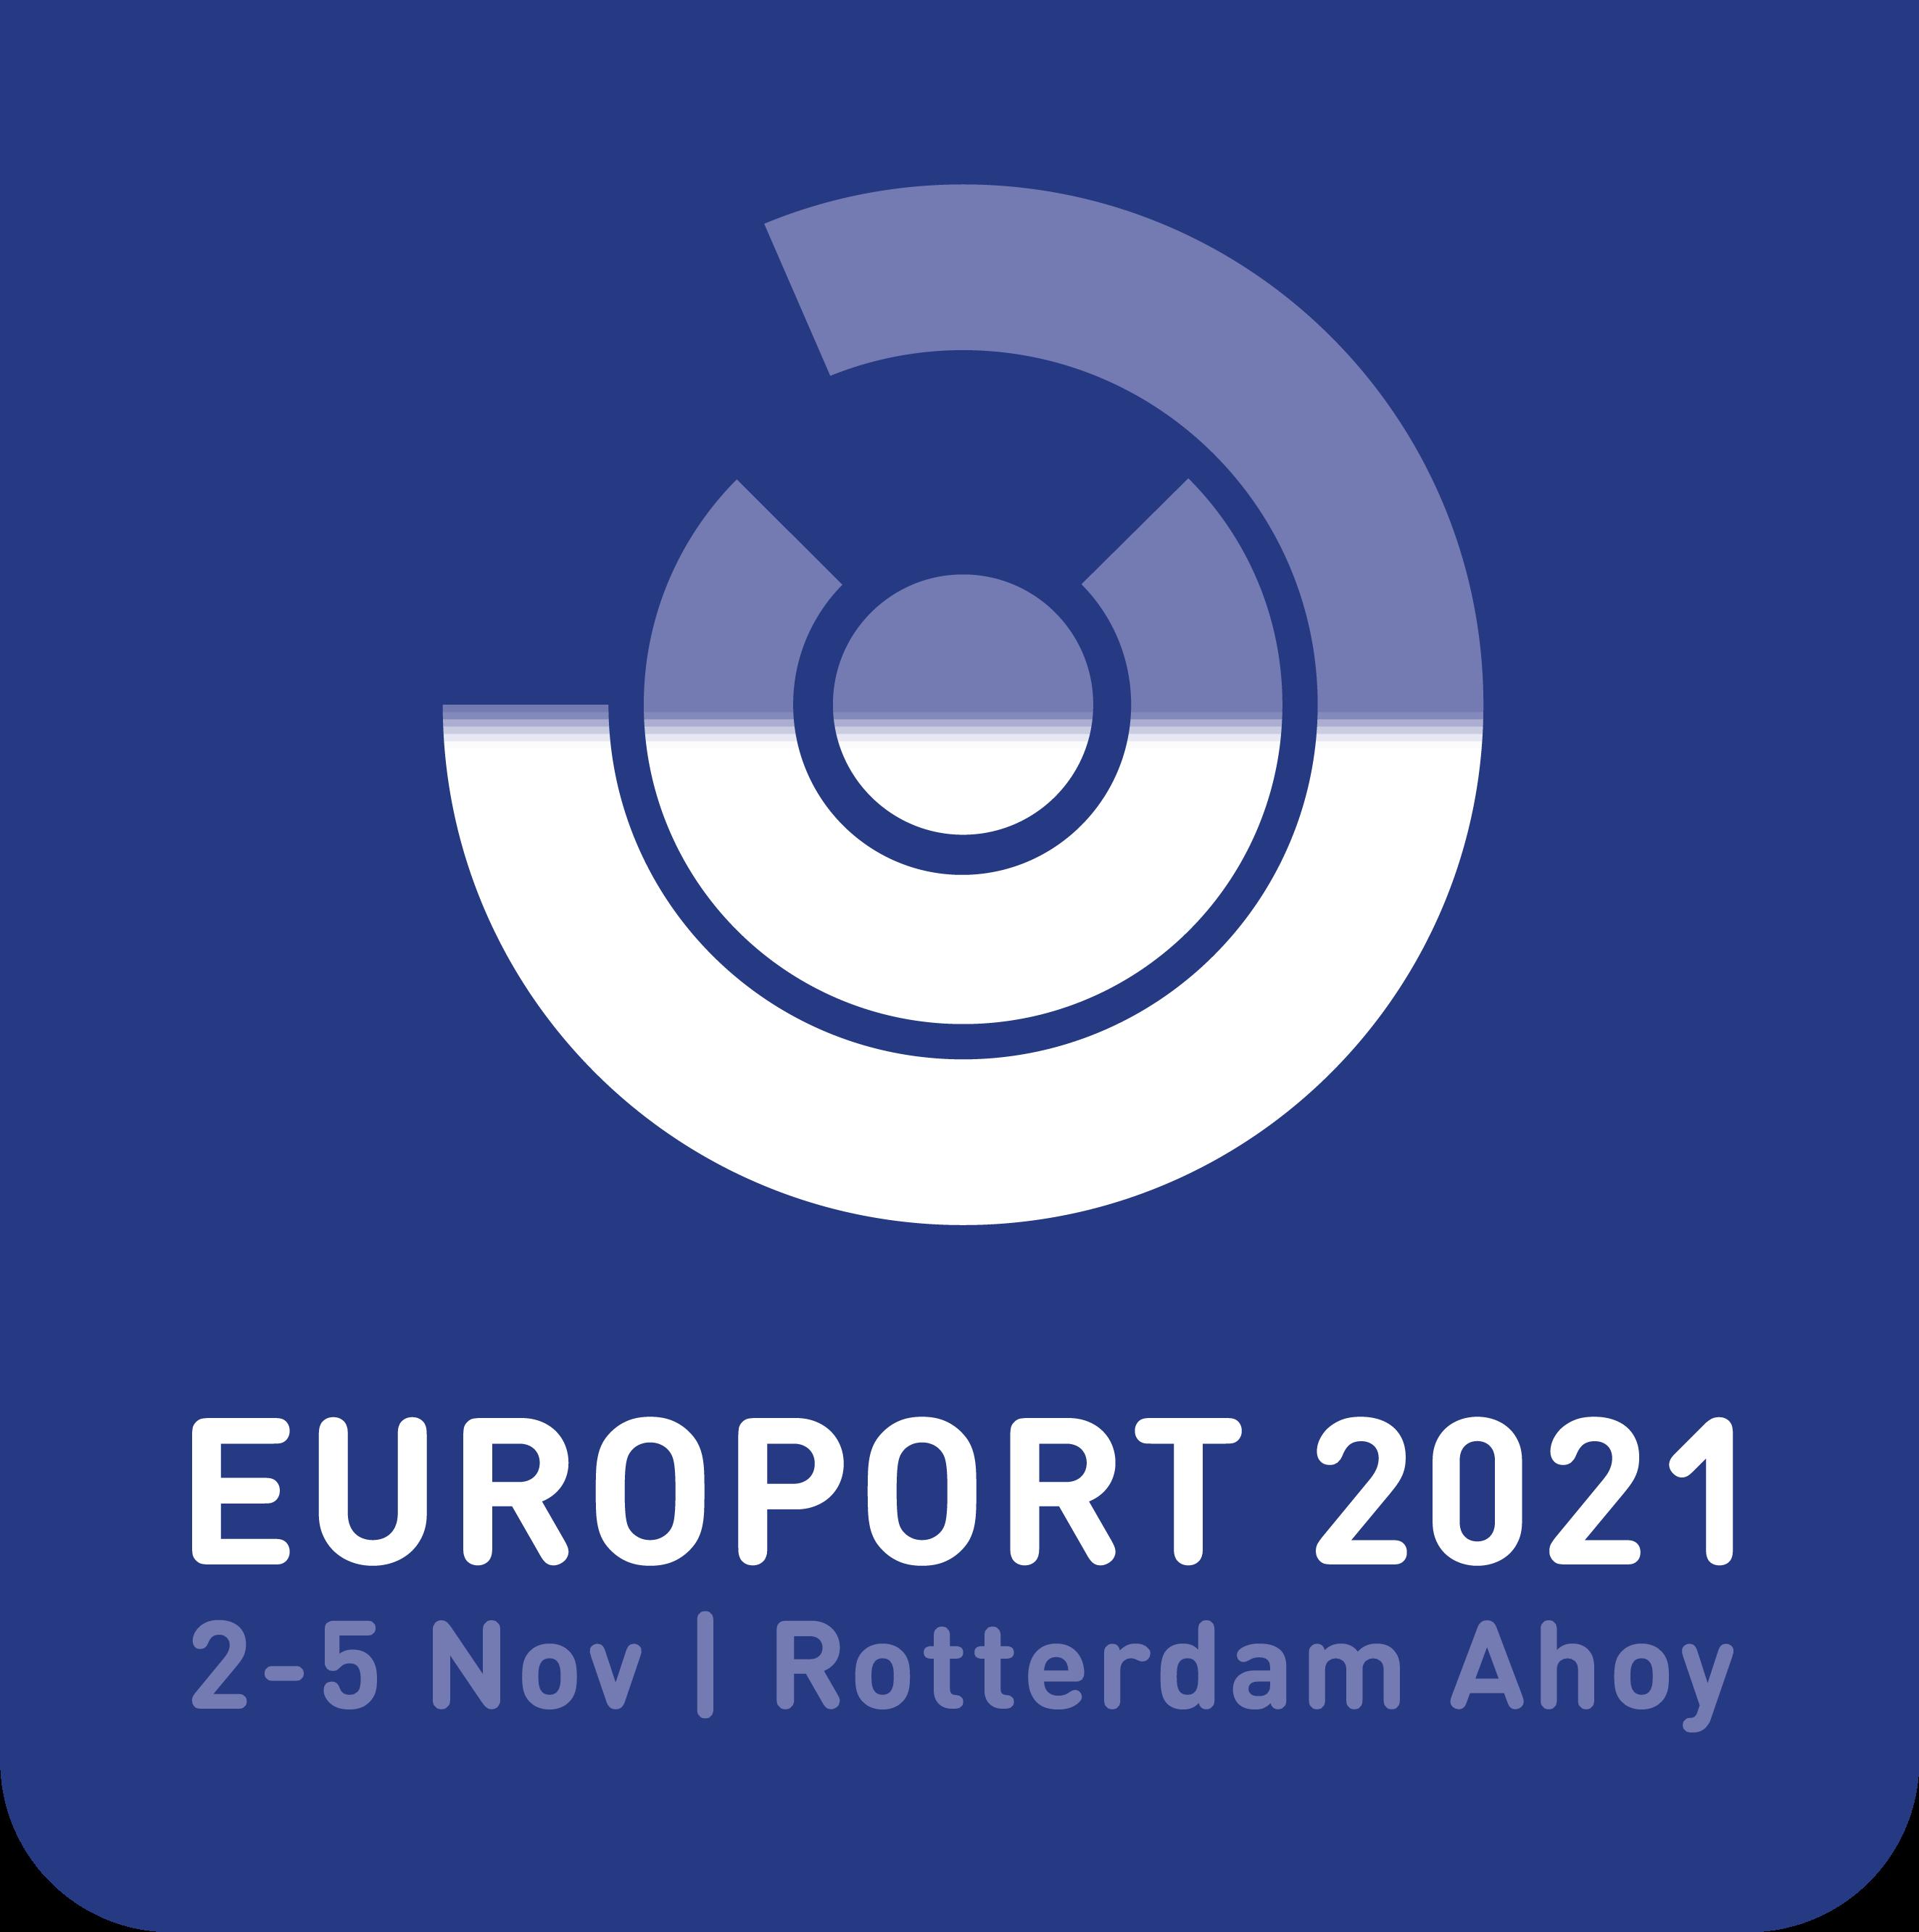 Europort